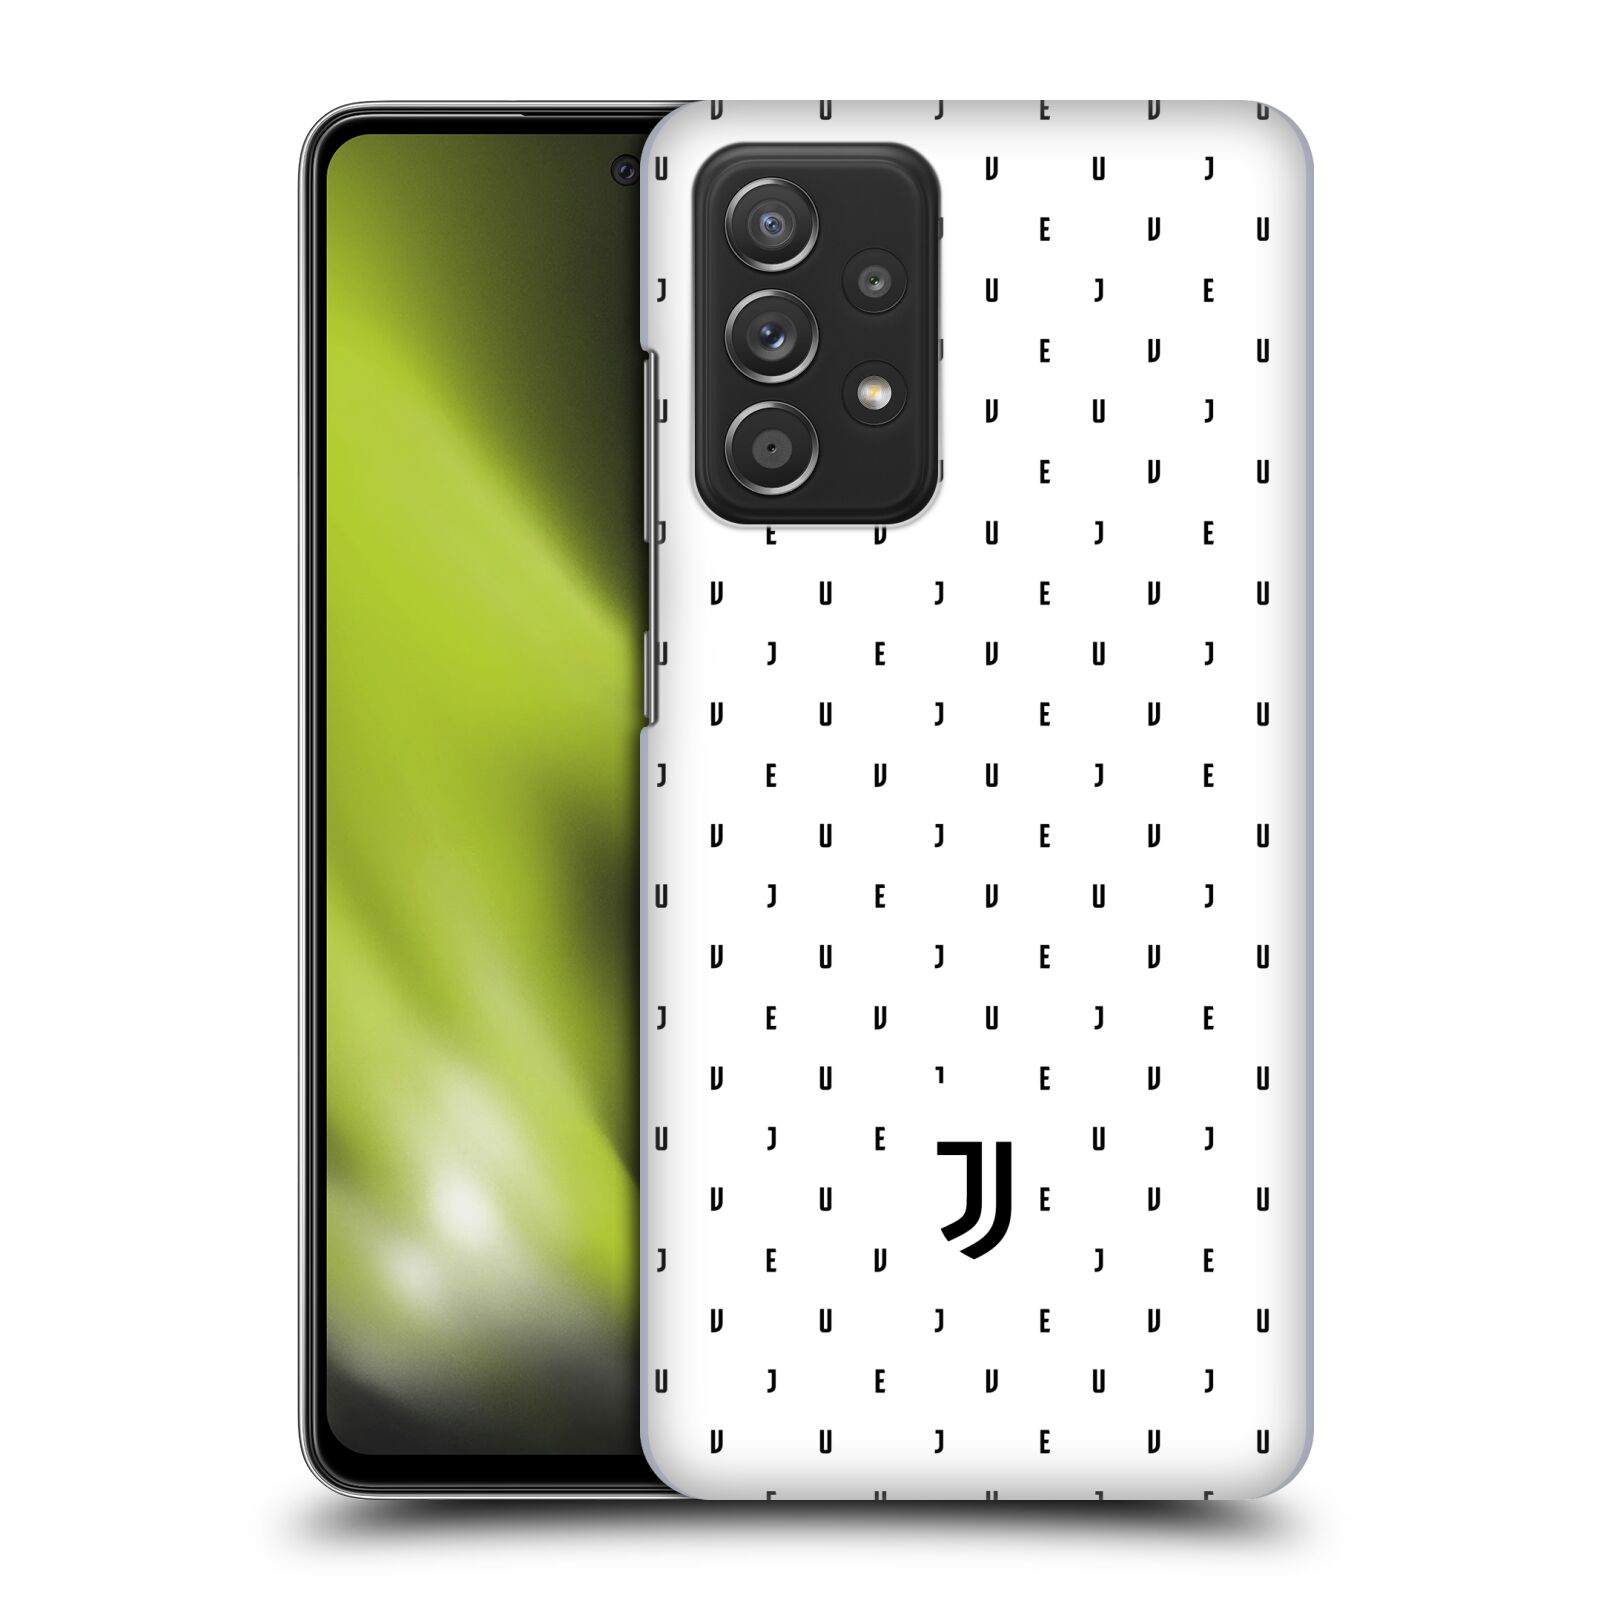 Plastové pouzdro na mobil Samsung Galaxy A52 / A52 5G / A52s 5G - Head Case - Juventus FC - Nové logo - Decentní